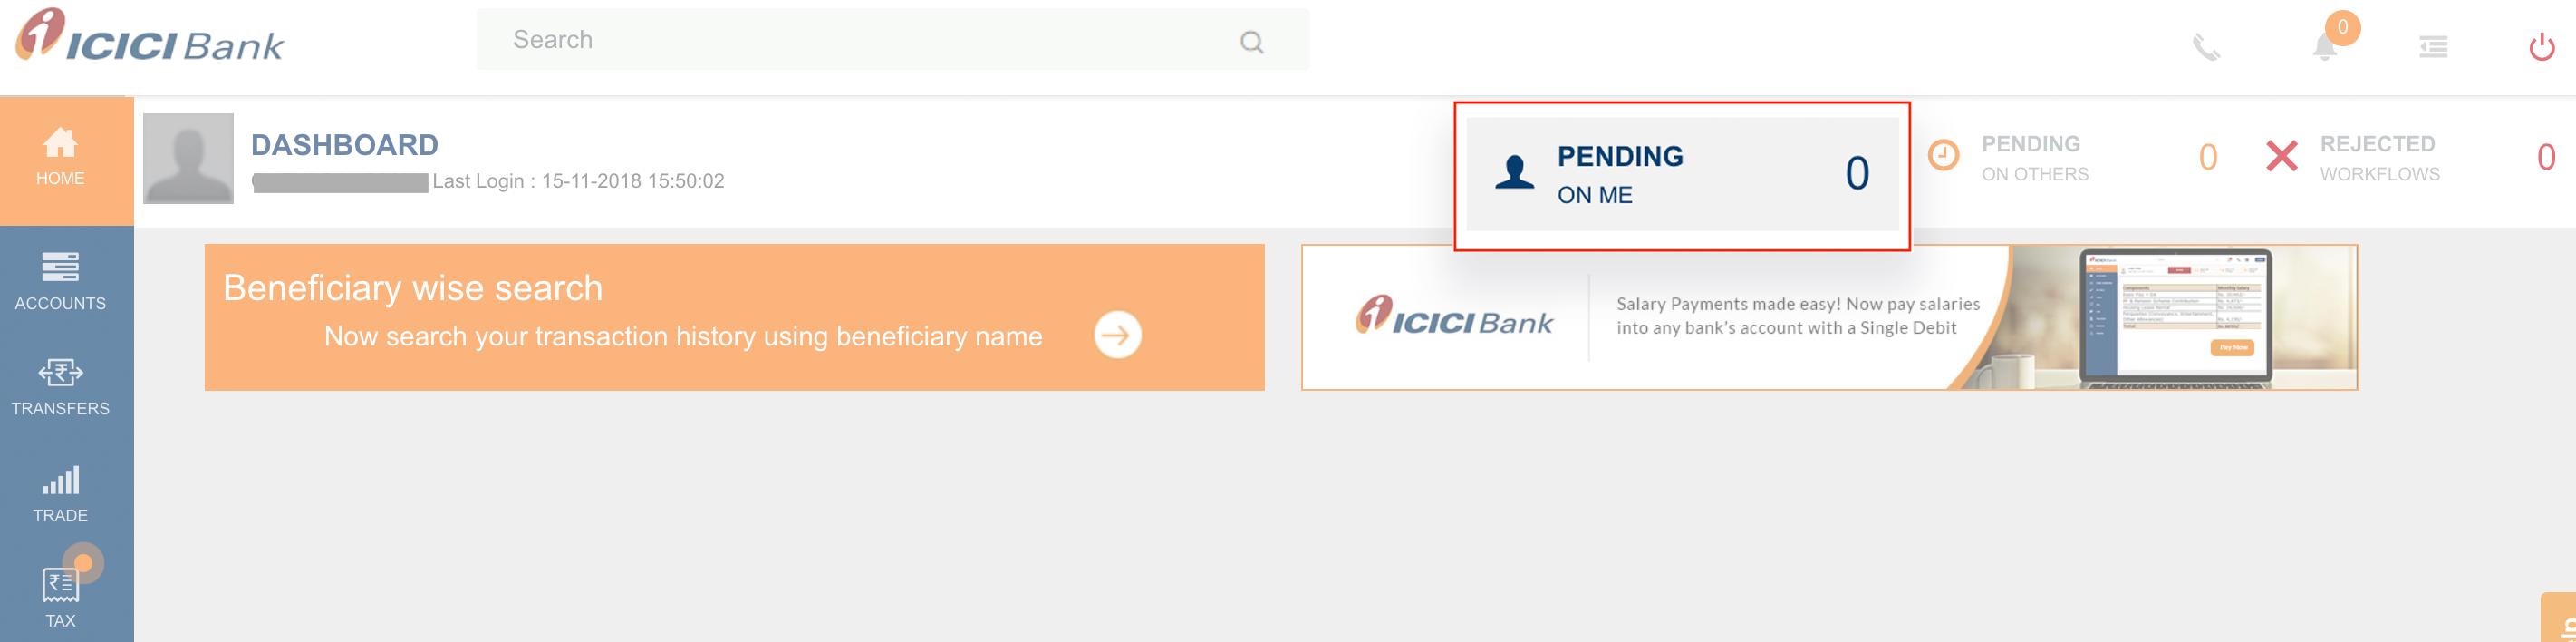 CIB Portal Dashboard